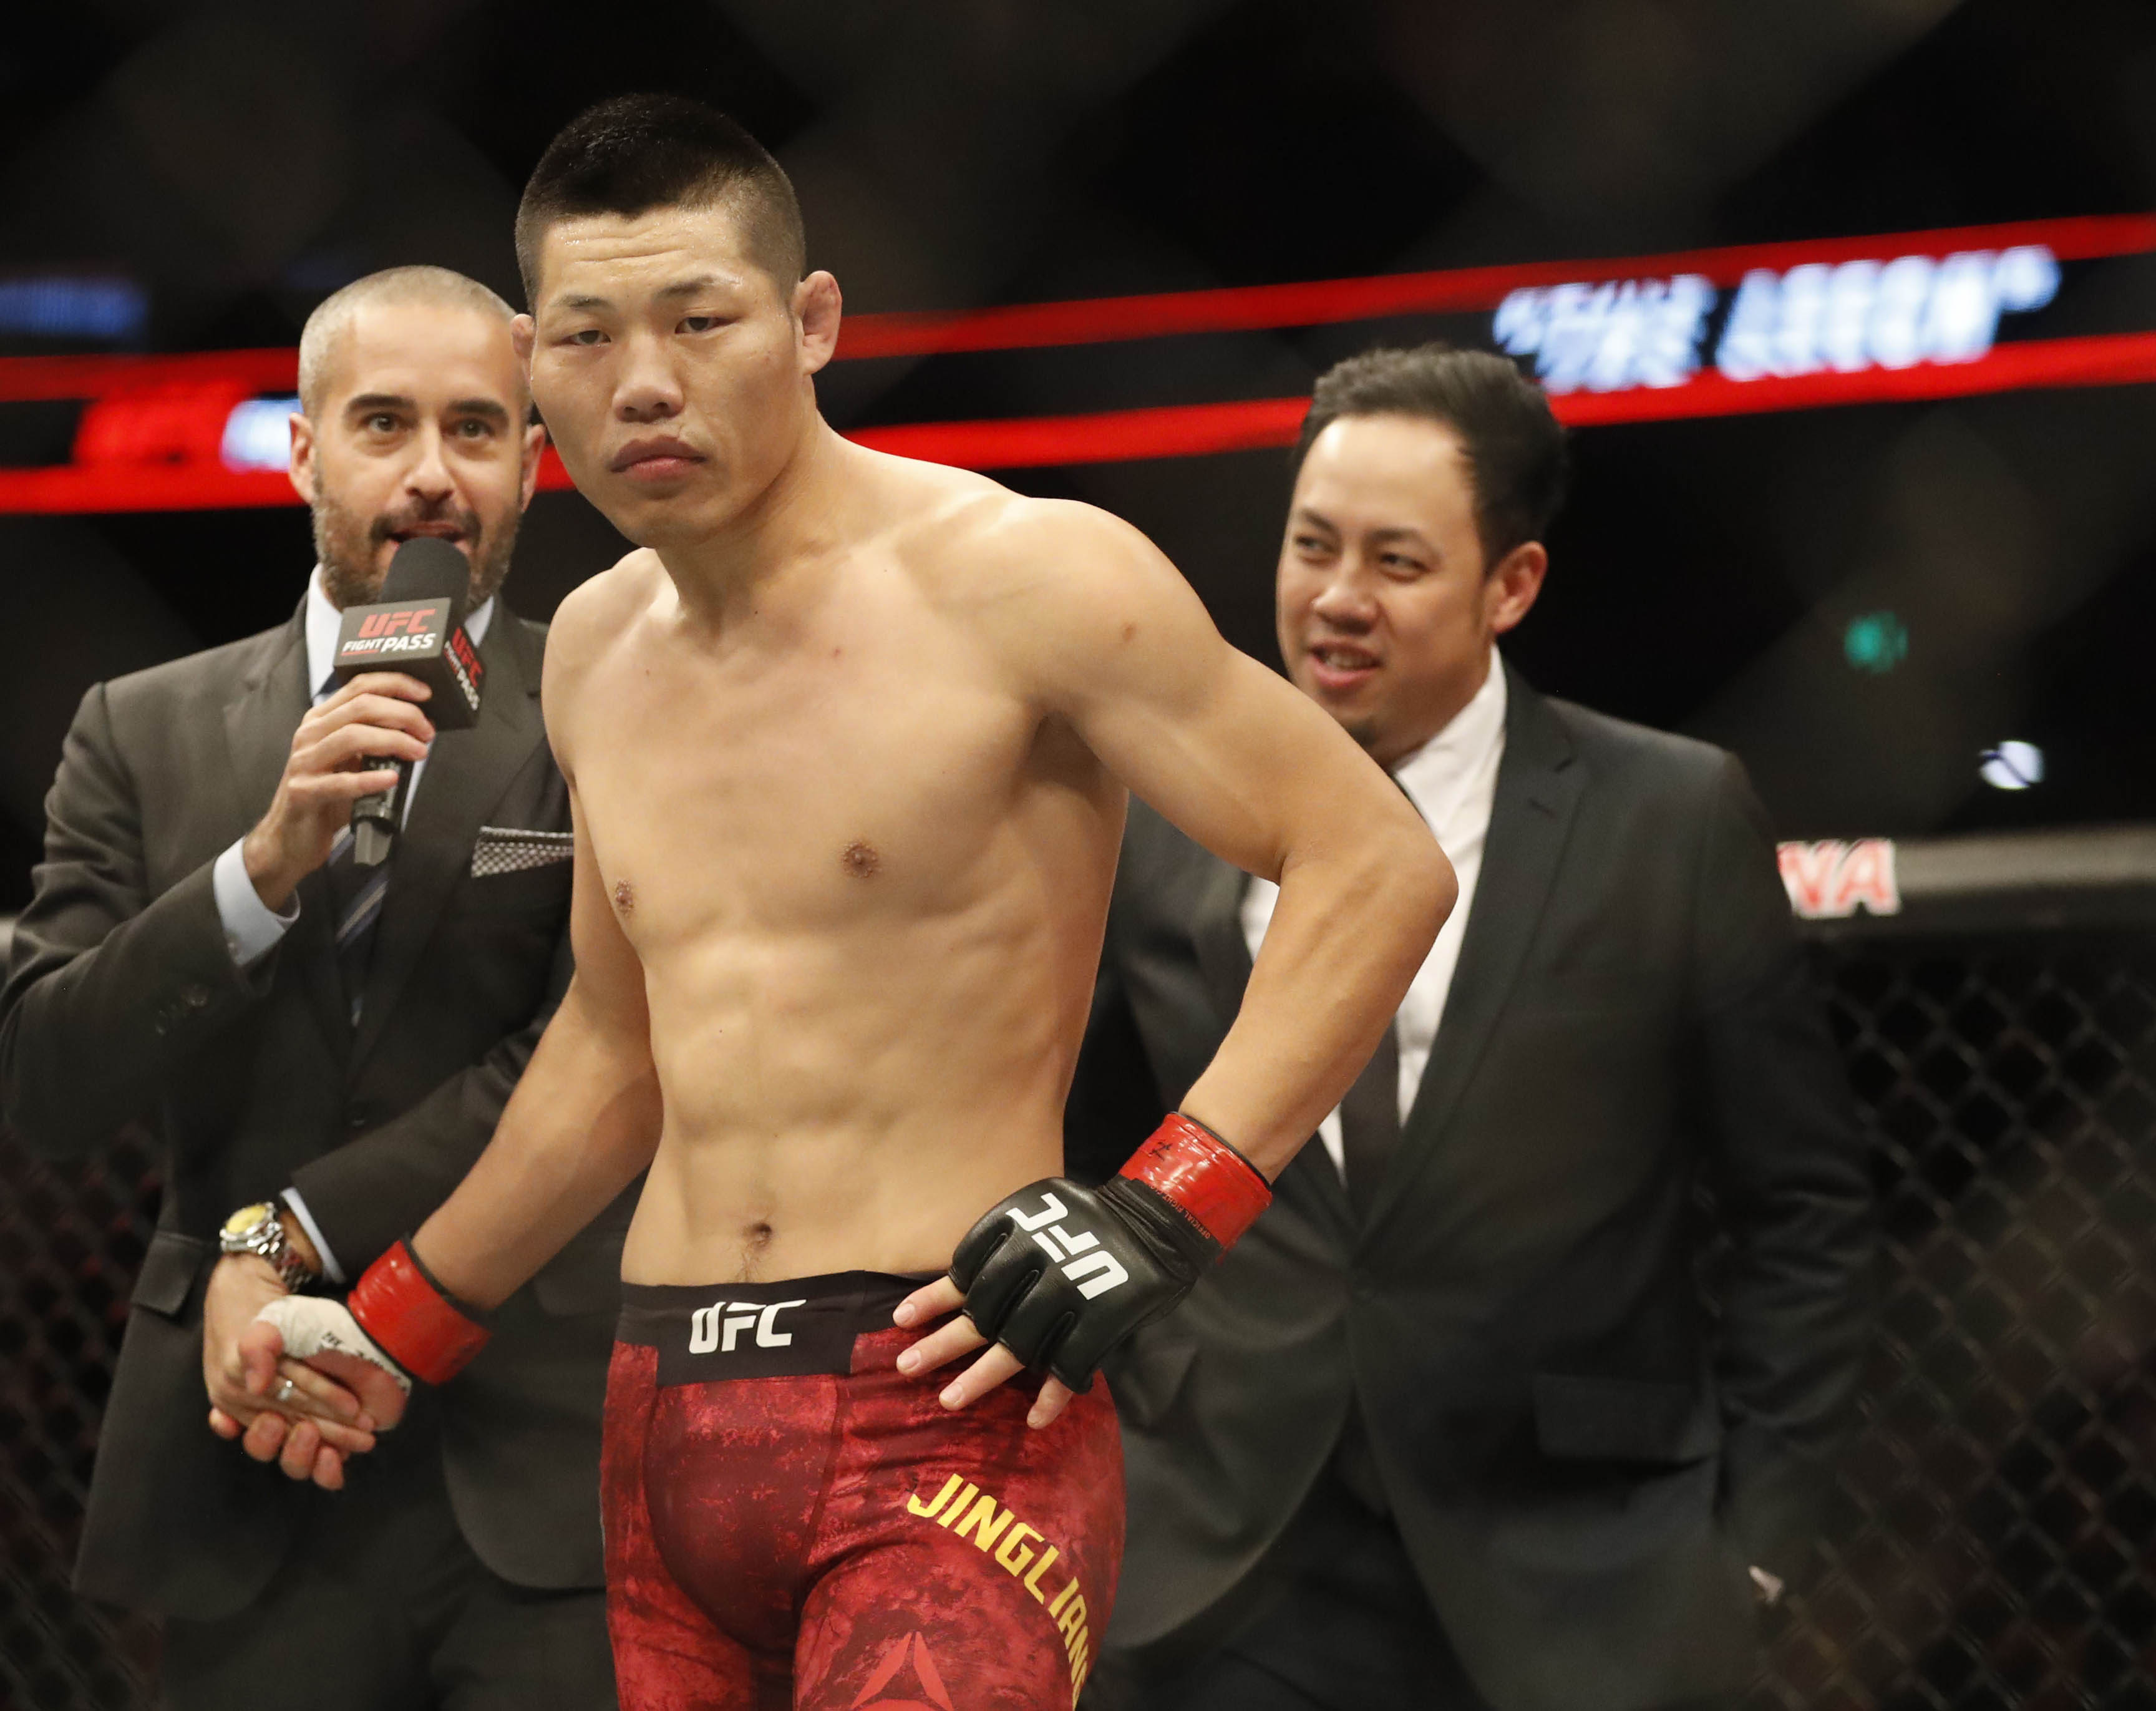 MMA: UFC Fight Night-Jingliang vs Ottow